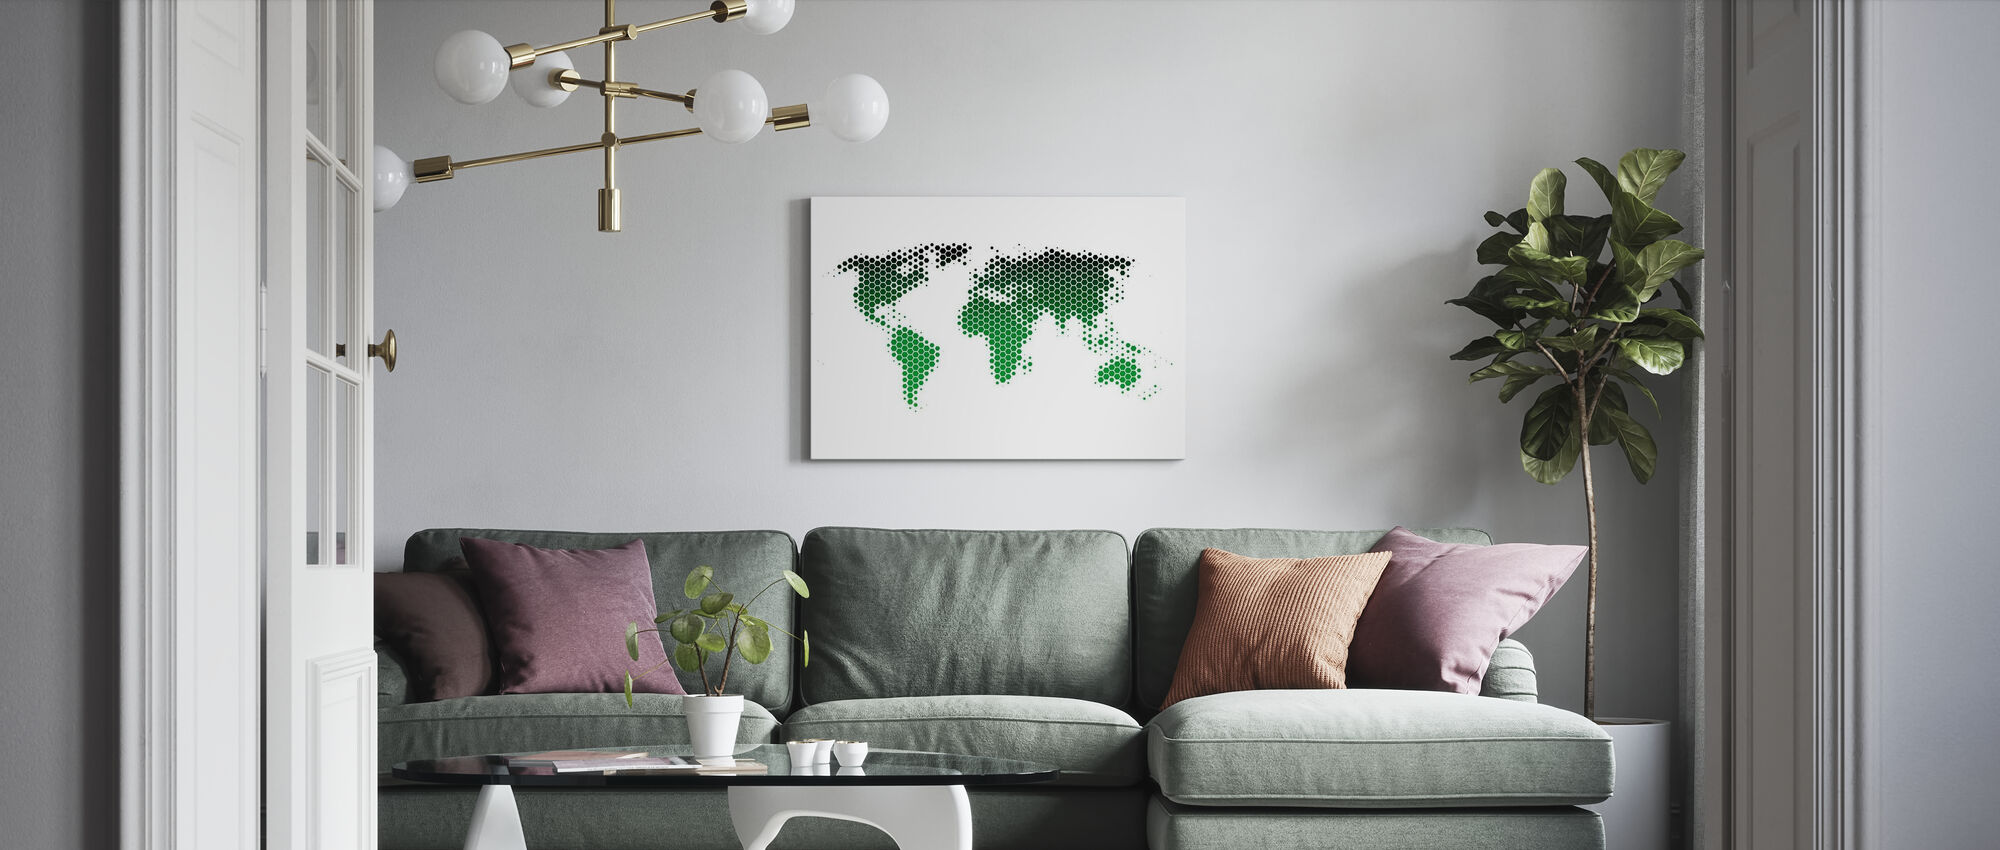 Världskarta Metallplåt - Grön - Canvastavla - Vardagsrum